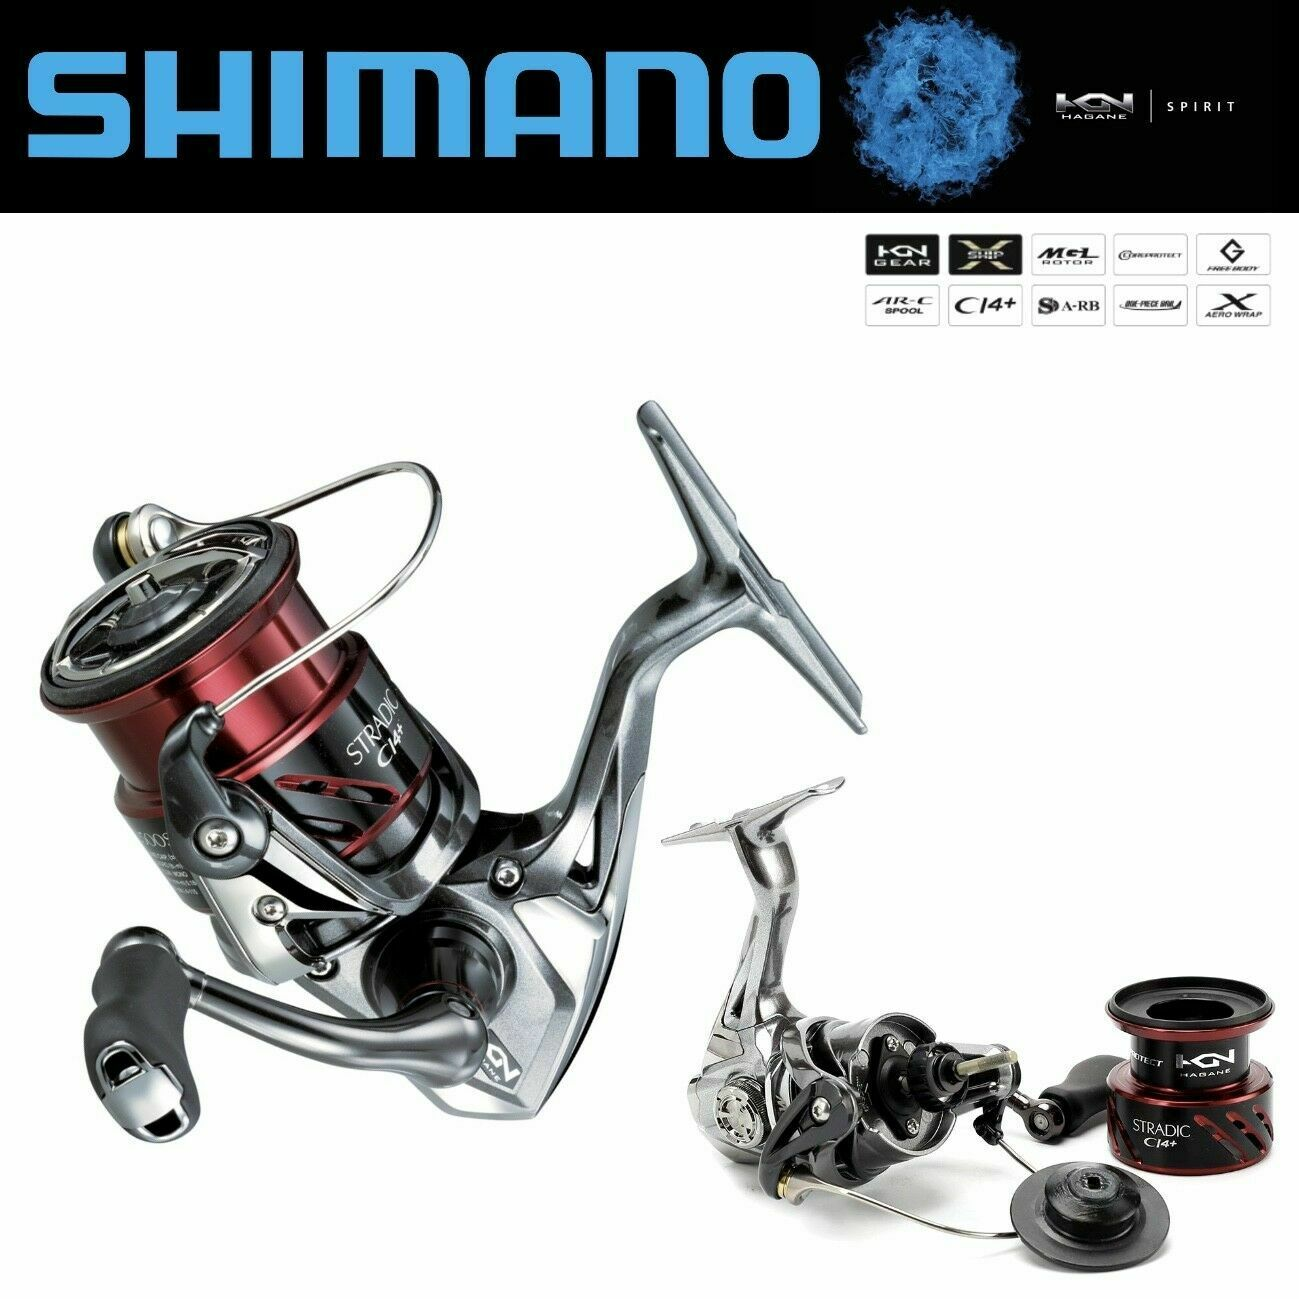 Shimano Spinning Cocheretes Stradic CI14